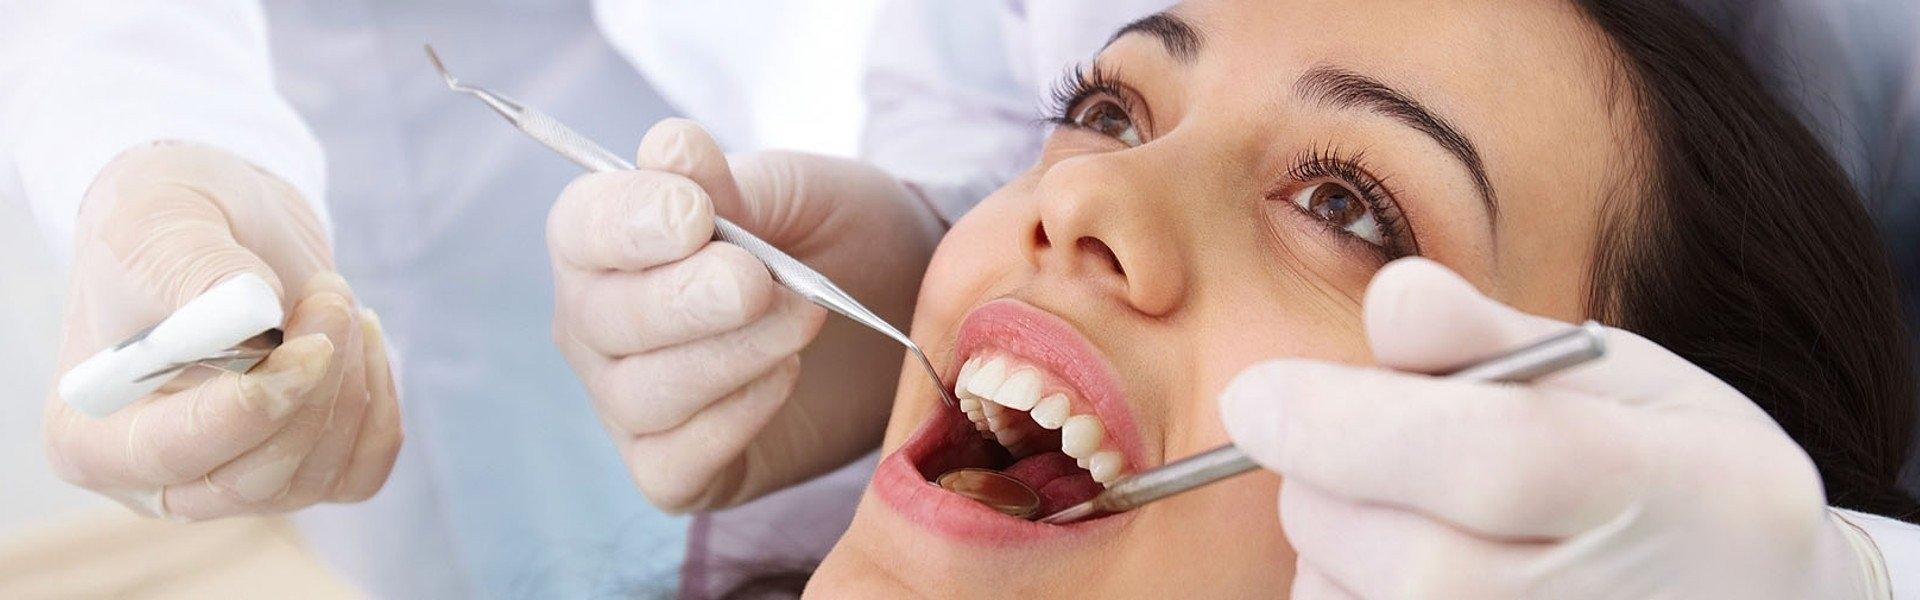 Dentysta Chorzów